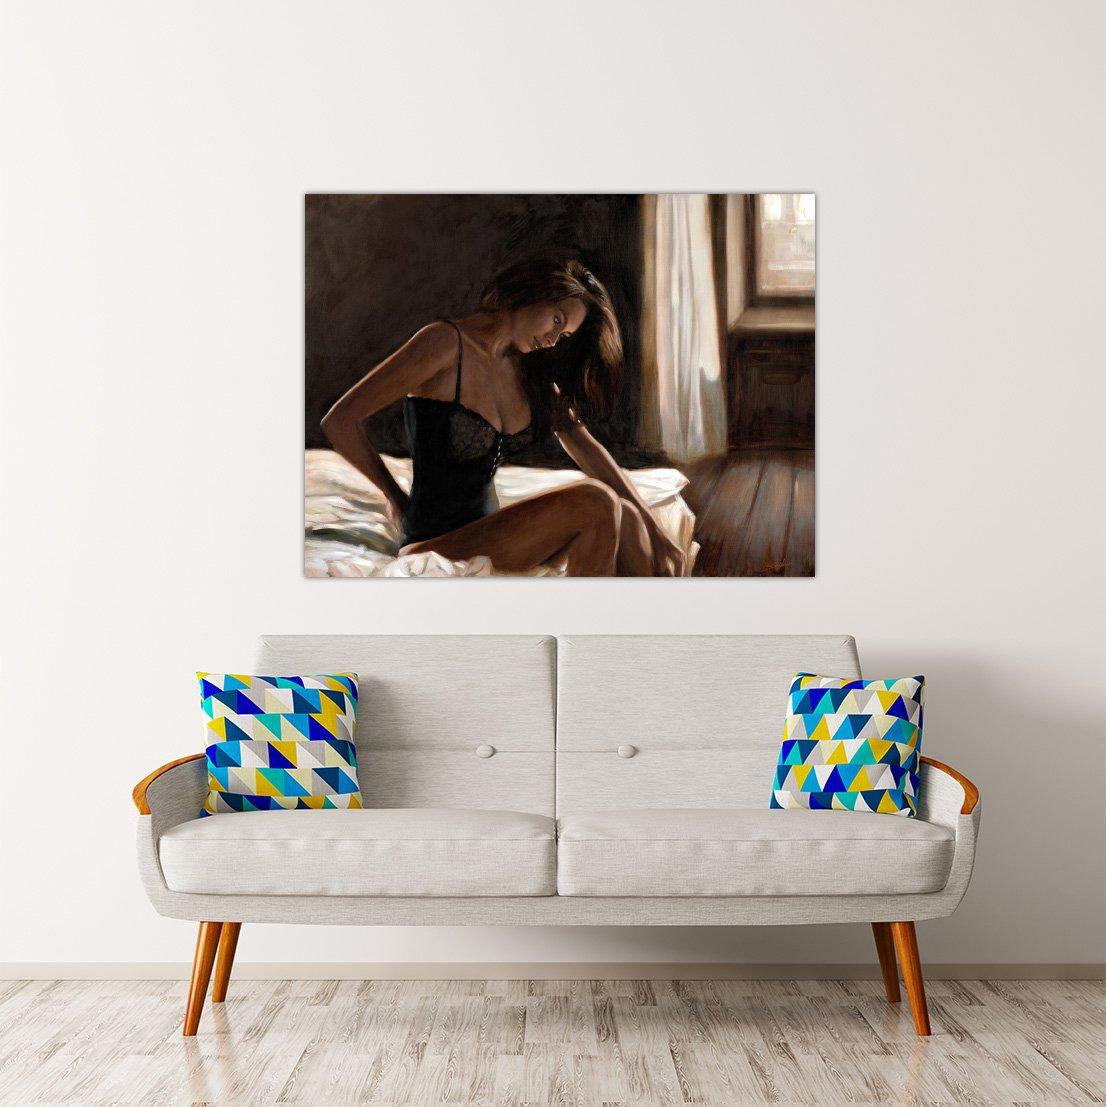 Rahmen Druck auf Leinwand Leinwand Leinwand mit Keilrahmen John Silber Dim Light 135x100 CM B07BTCS51B | Spezielle Funktion  562f13